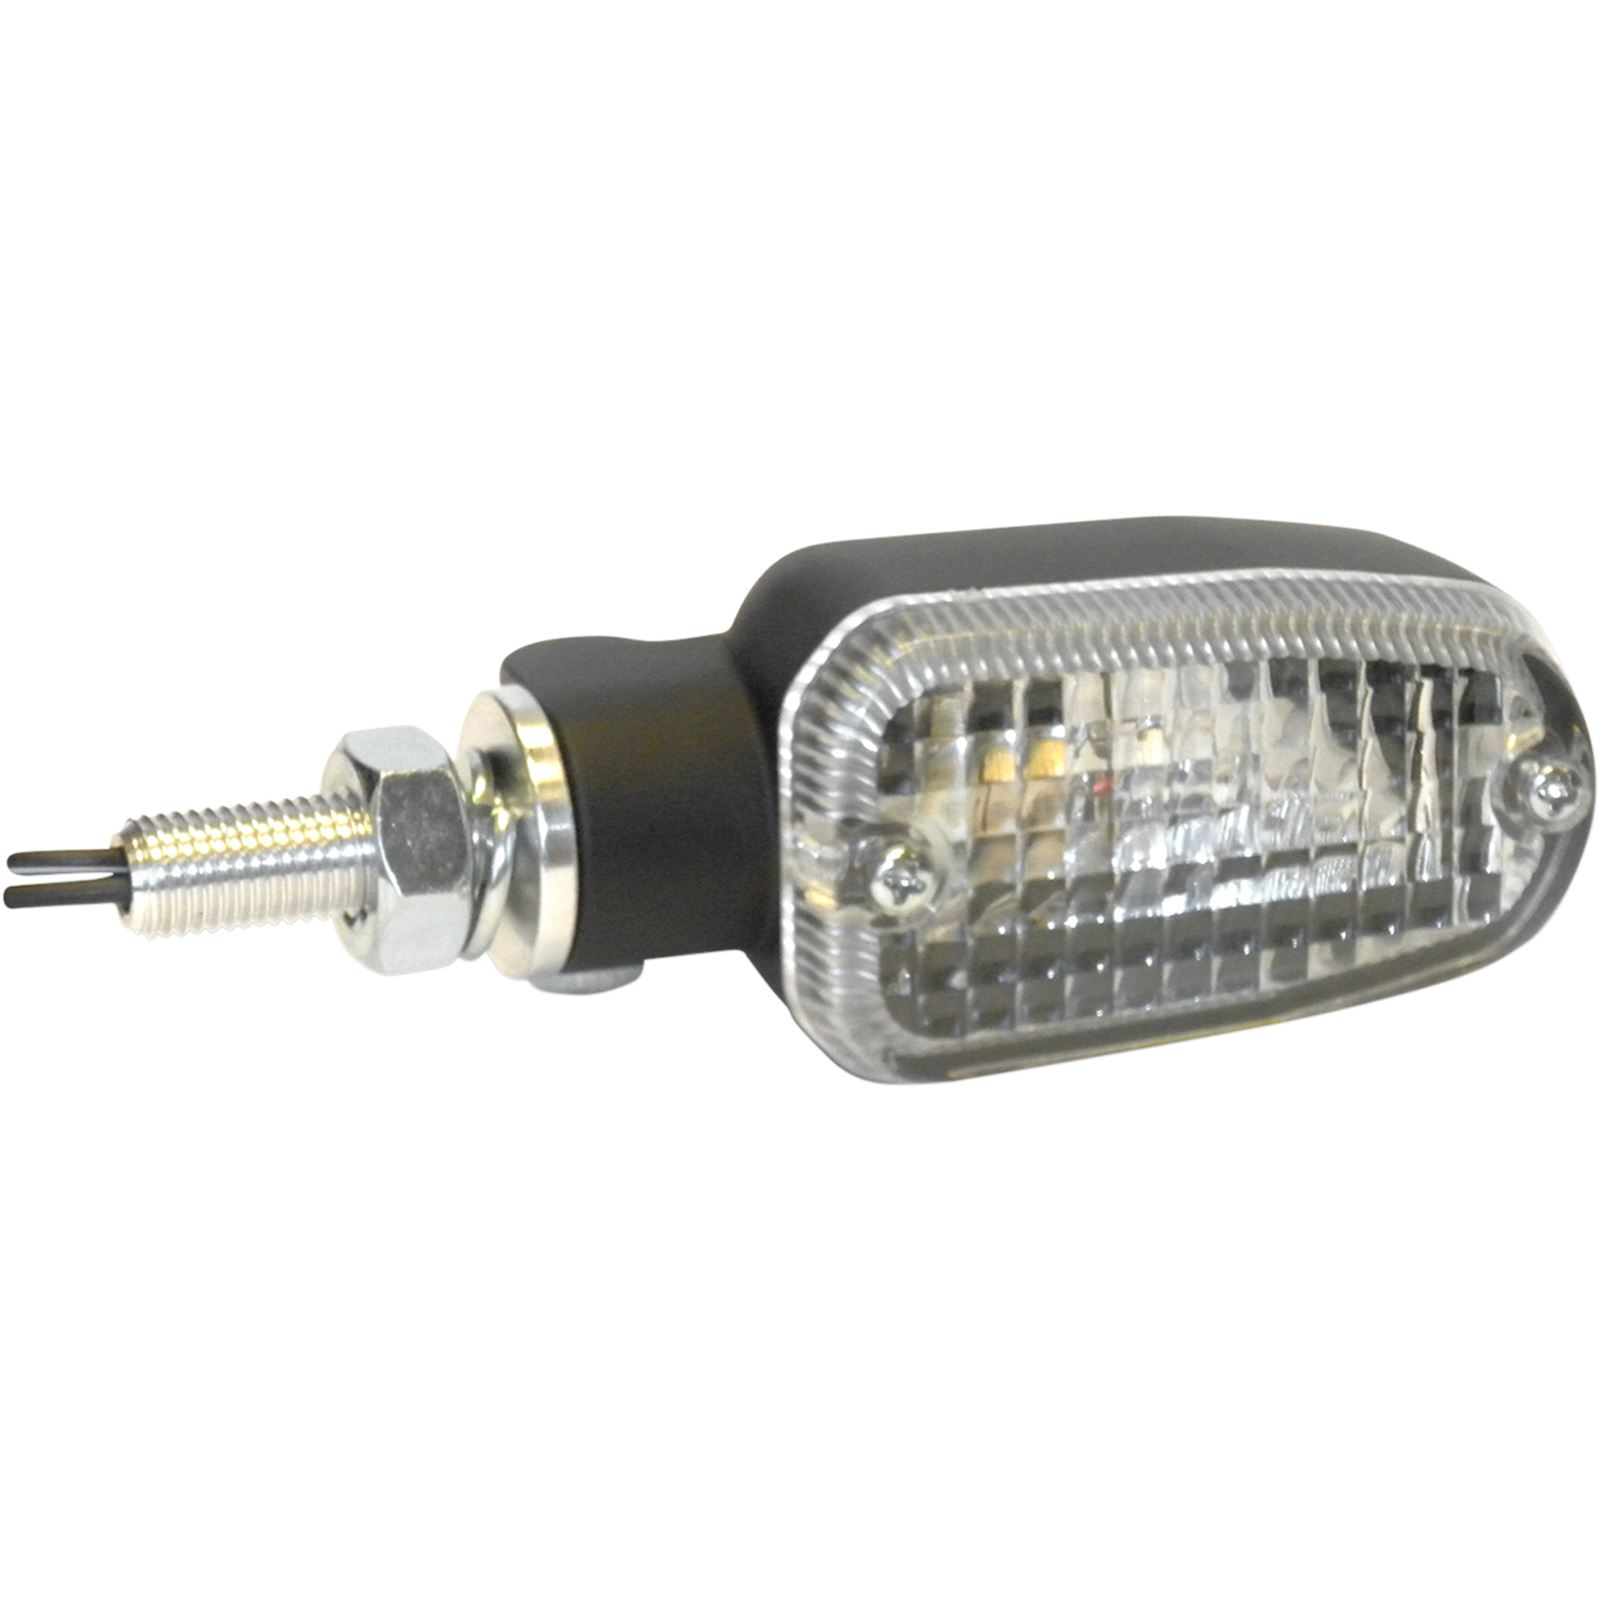 K S Turn Signal - DOT-Compliant/E-Marked - Single Filament - Black/Clear